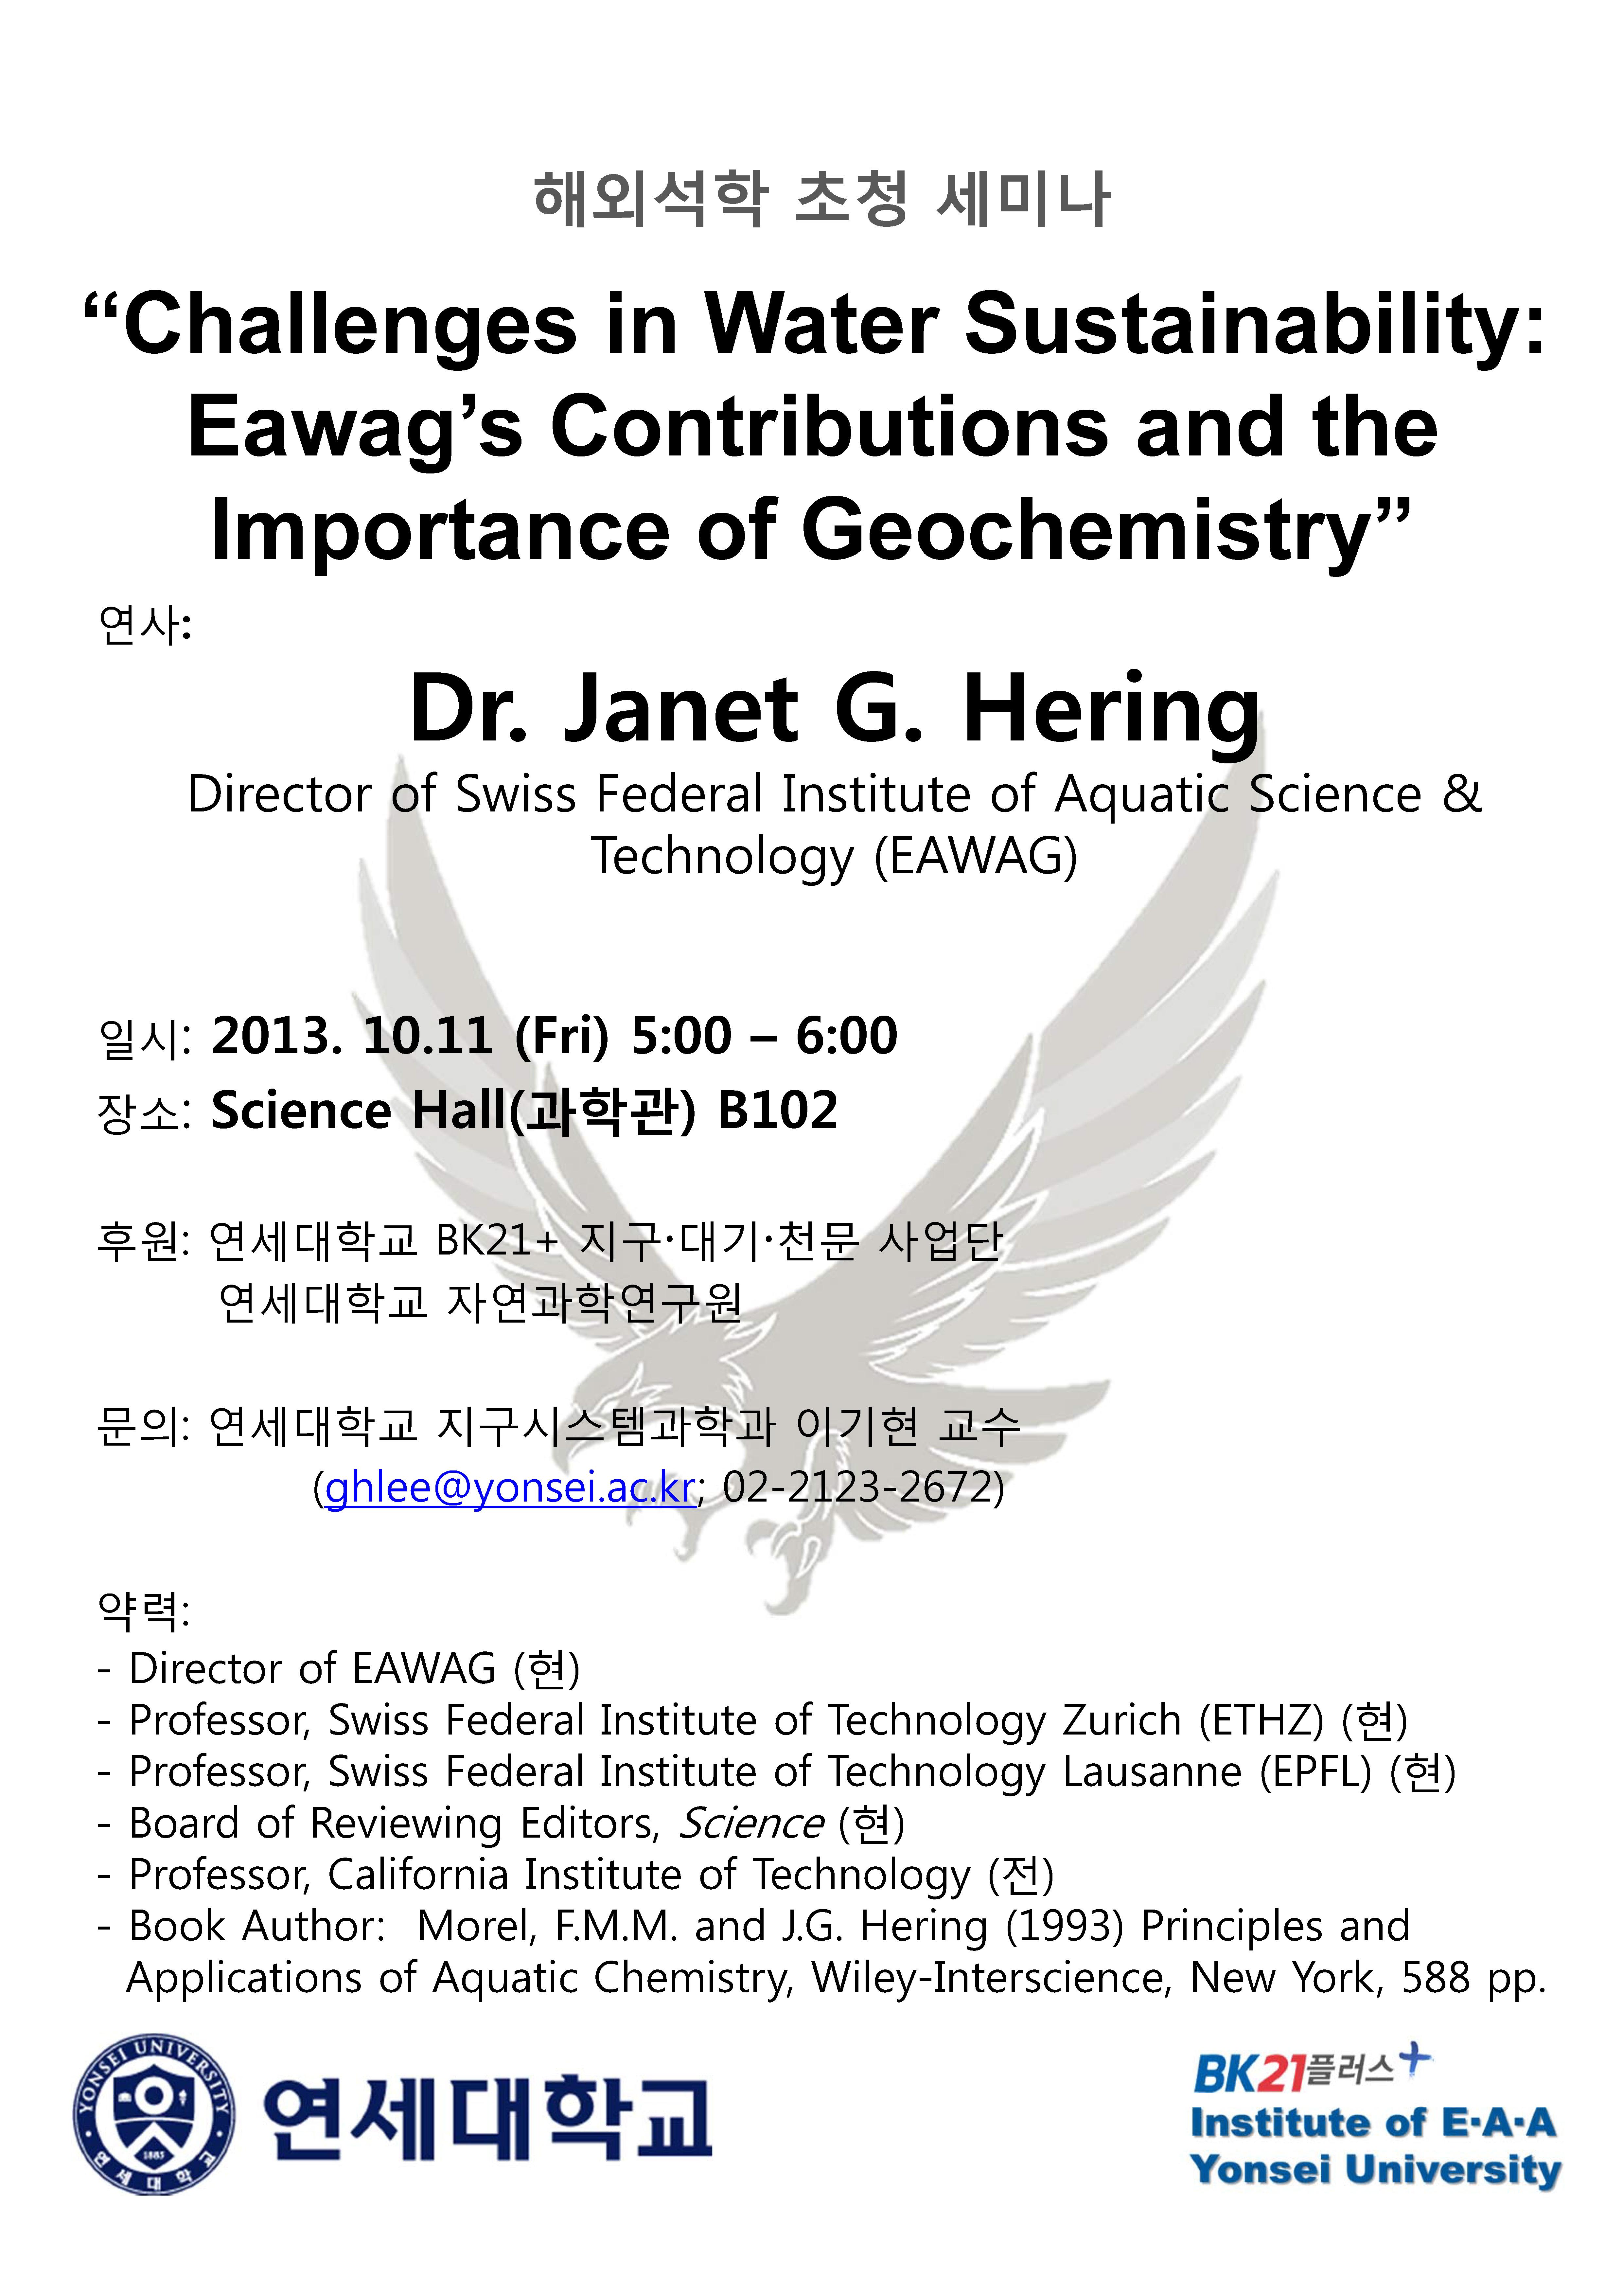 Dr Janet Hering seminar flyer.jpg